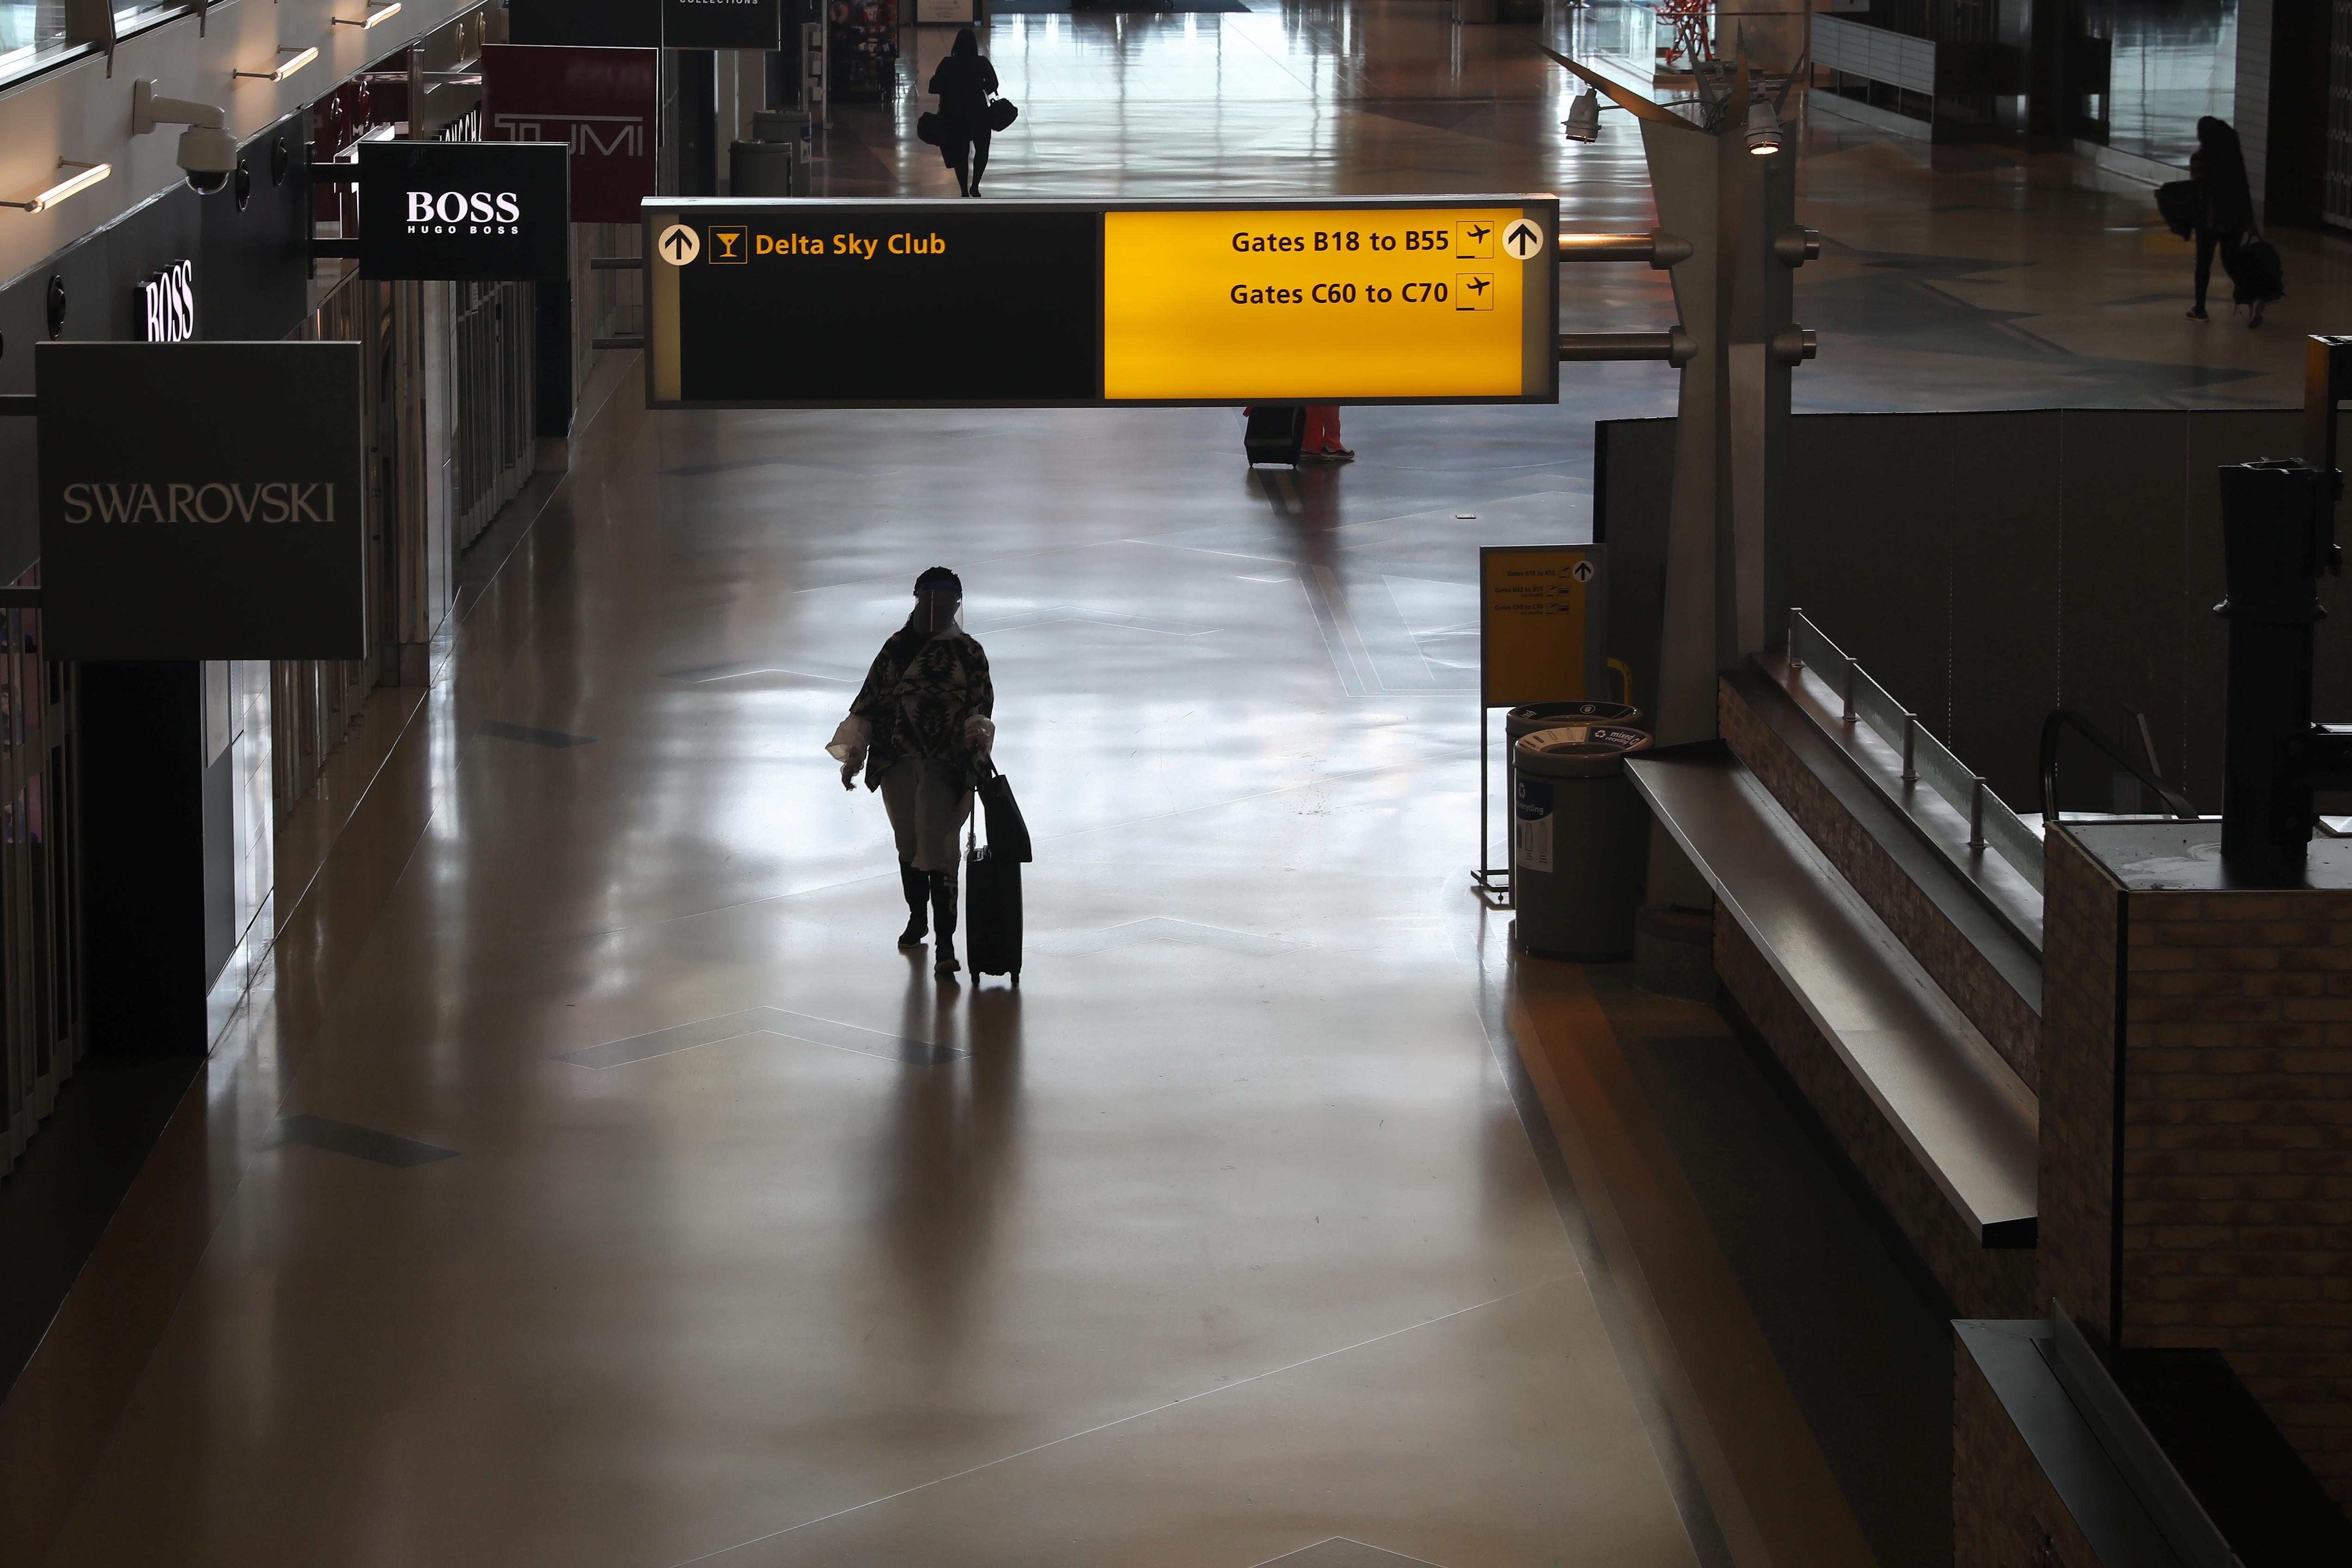 Air travelers walk through a terminal as the coronavirus disease (COVID-19) outbreak continues, at New York's JFK International Airport in New York, U.S., May 15, 2020. REUTERS/Shannon Stapleton